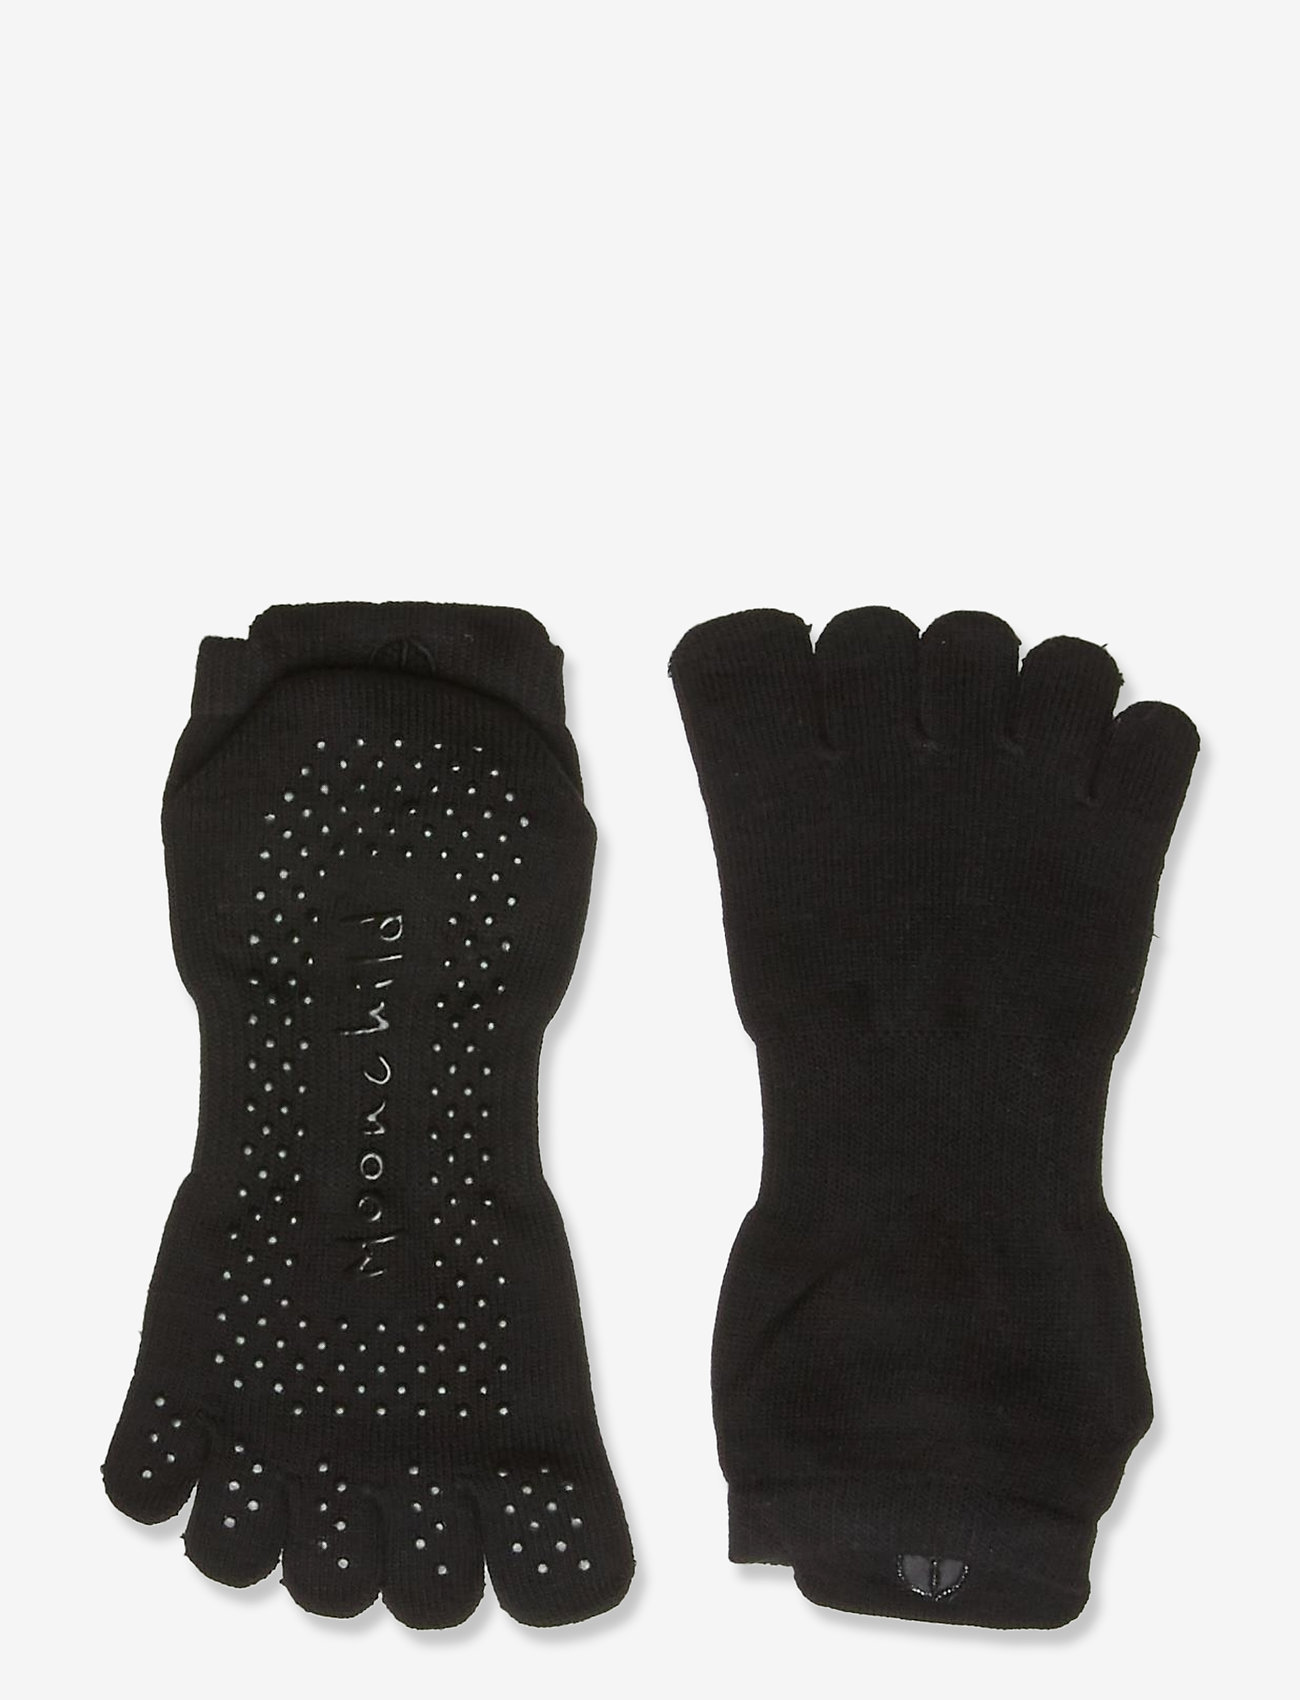 Moonchild Yoga Wear - Moonchild Grip Socks - Low Rise - yogamatten & uitrusting - onyx black - 1